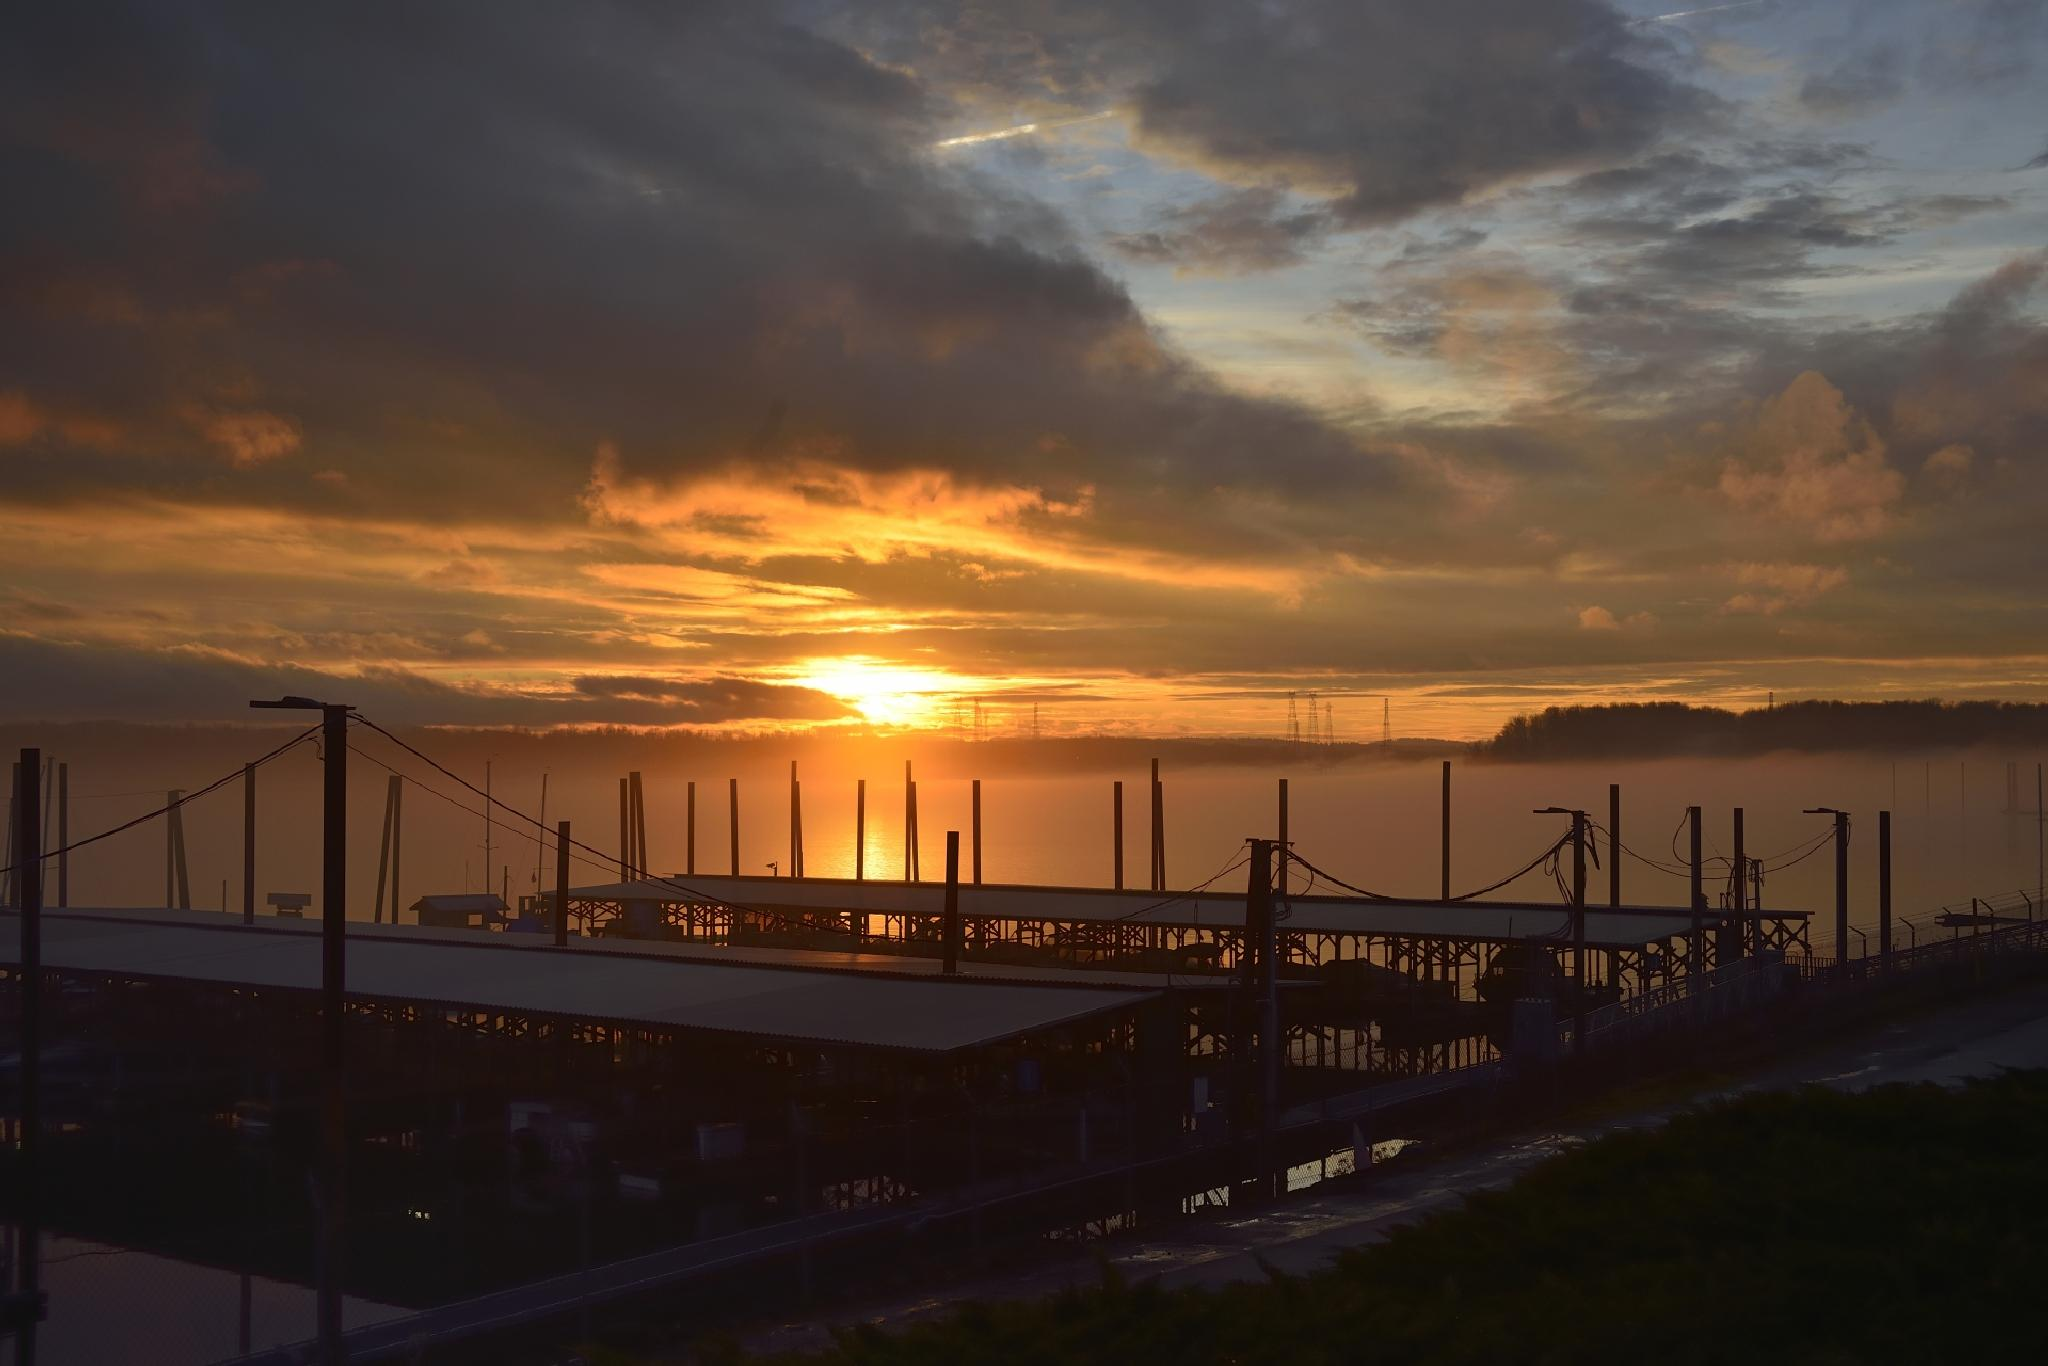 Sunset Over the Marina by Leback